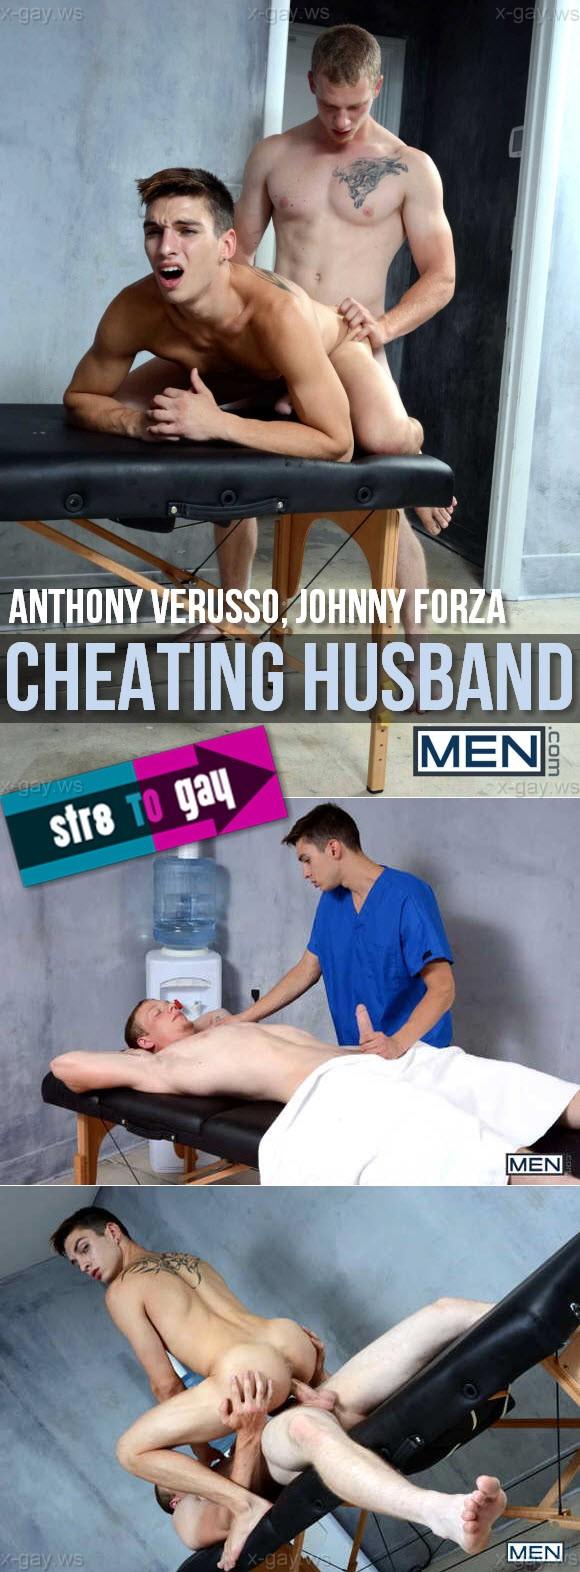 men_str8togay_cheatinghusband_part1.jpg